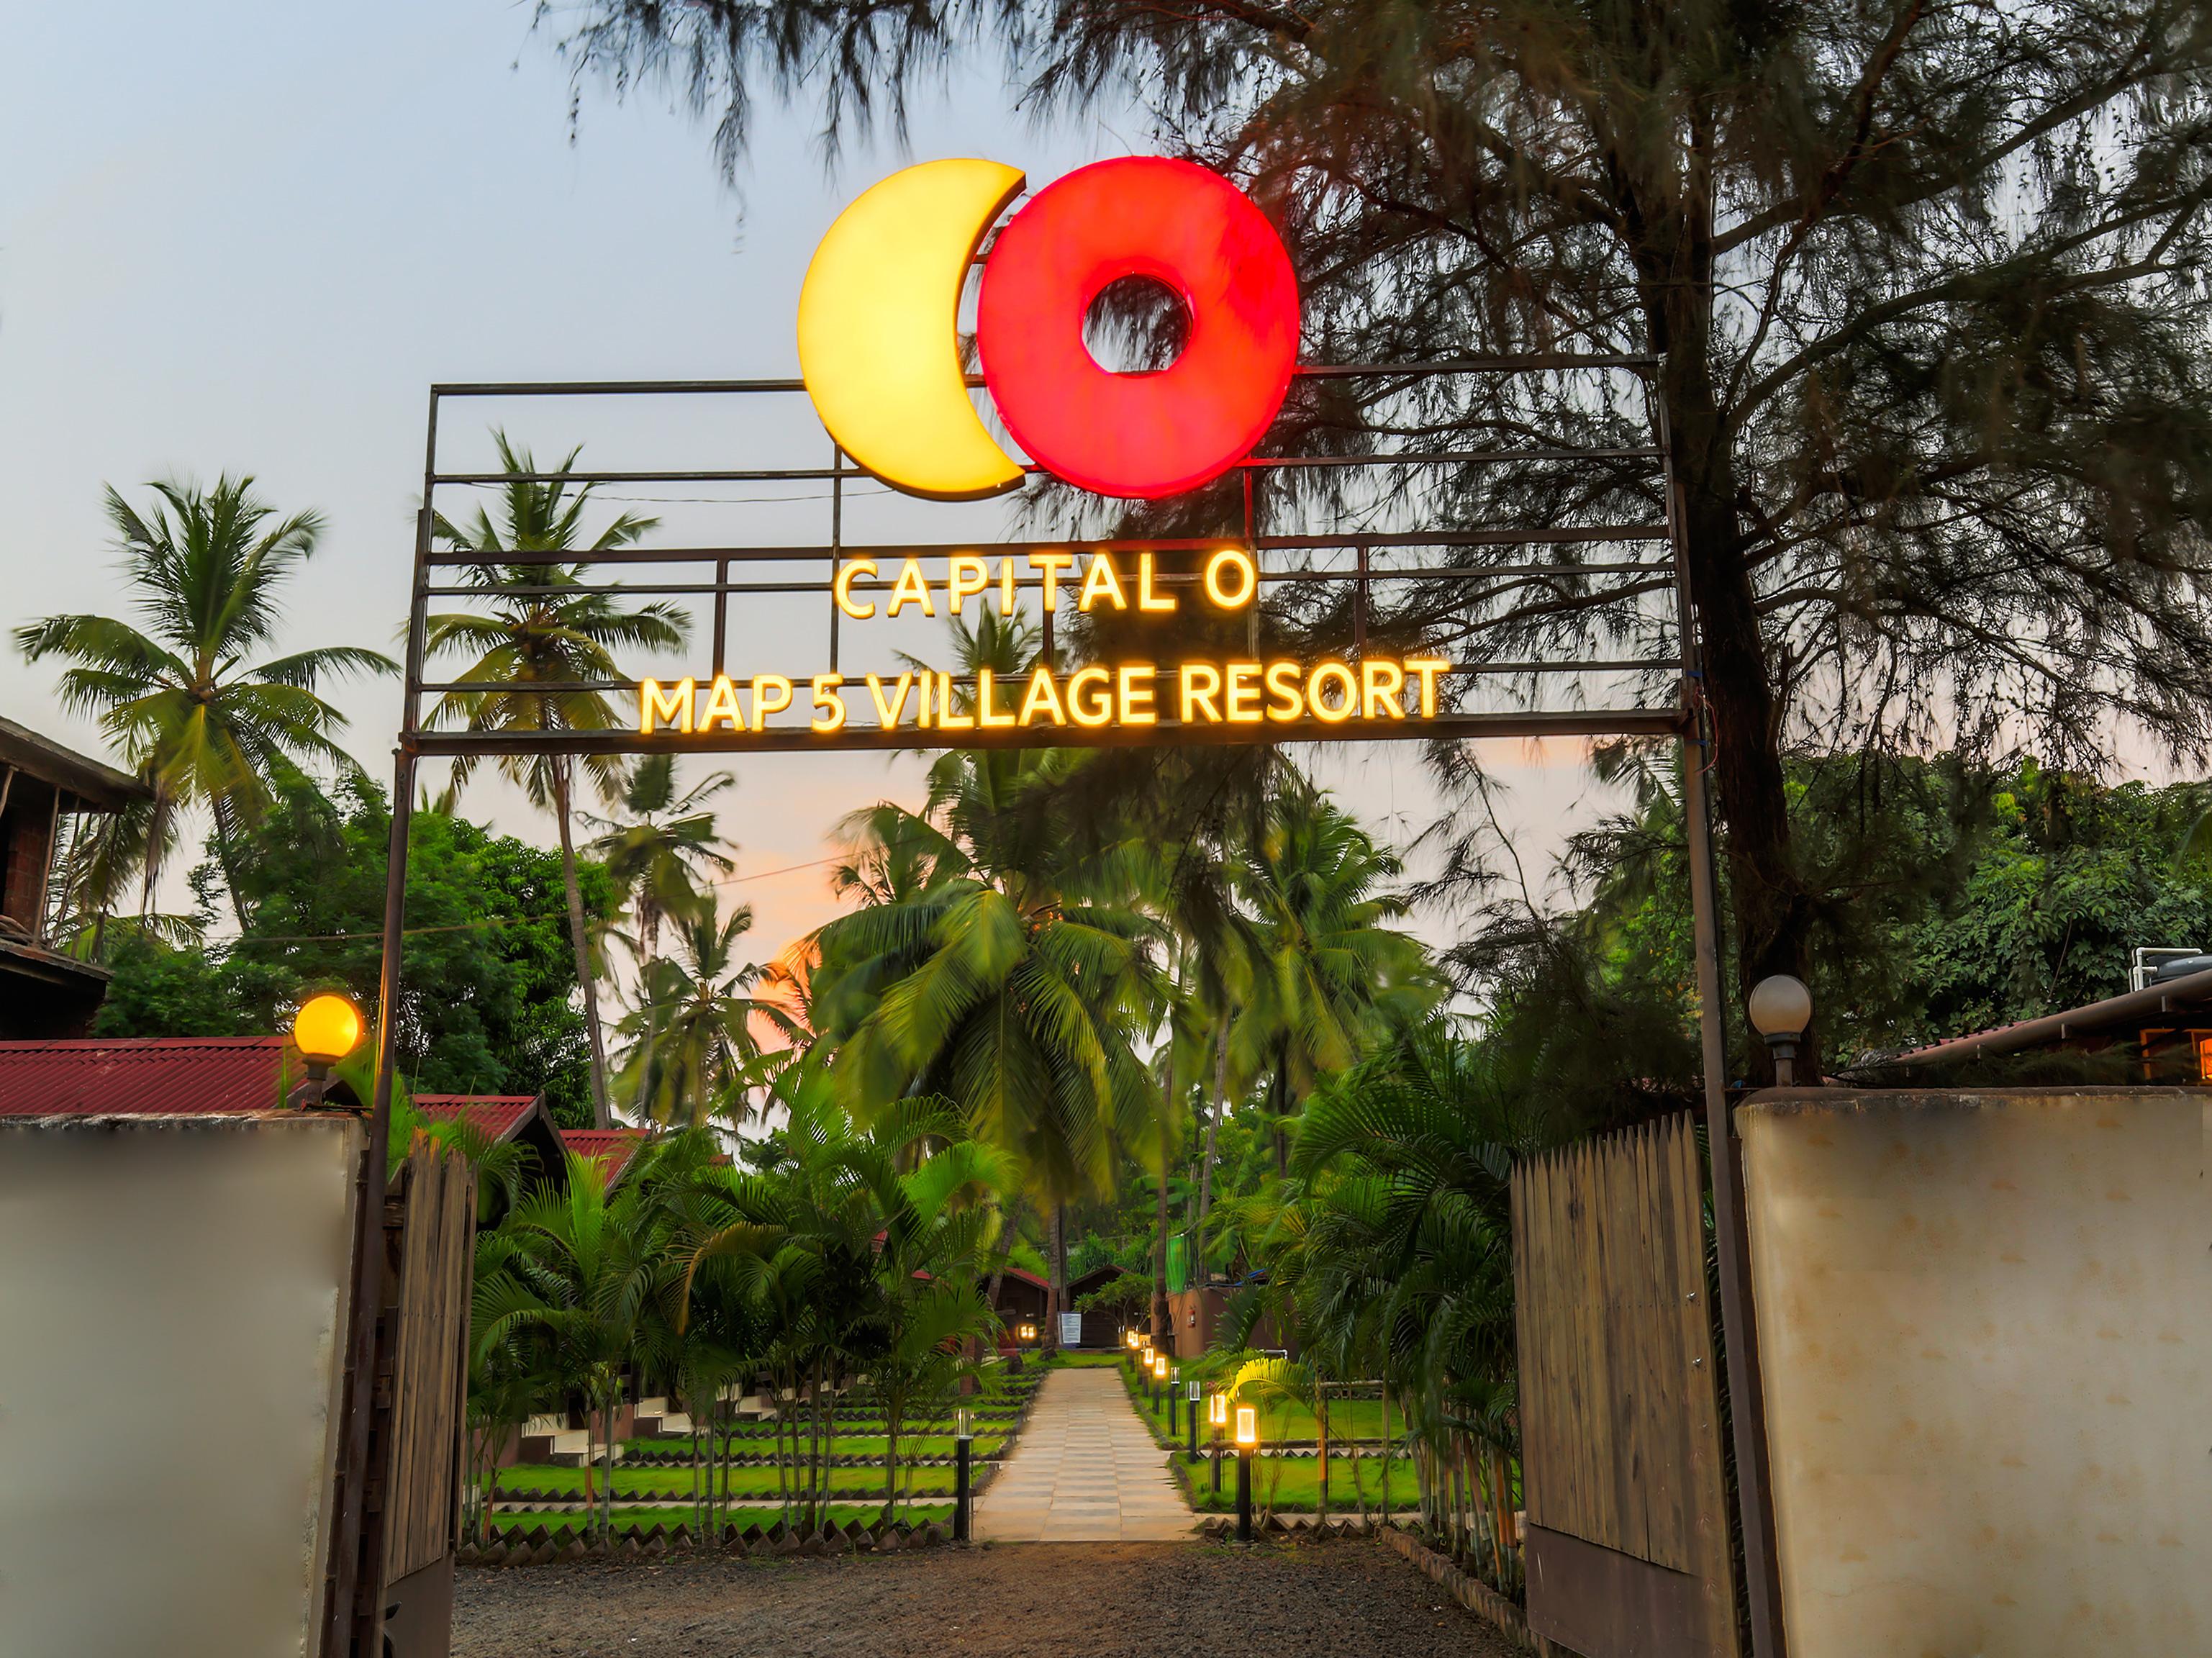 Capital O 8058 Map5 Village Resort